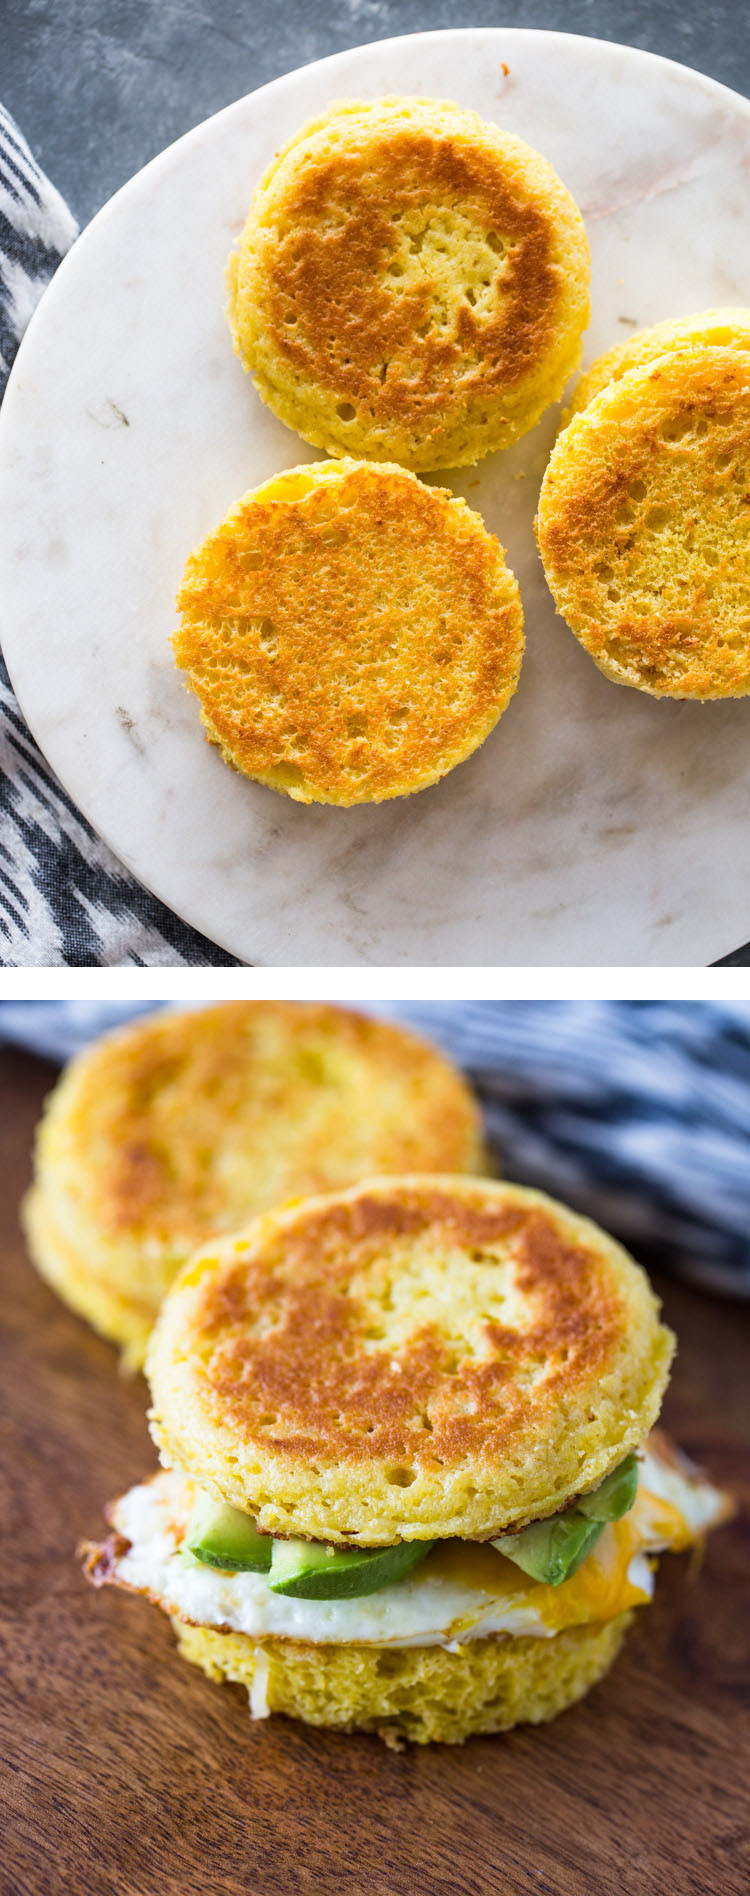 Keto Sandwich Bread Microwave  90 Second Microwavable Low Carb Keto Bread